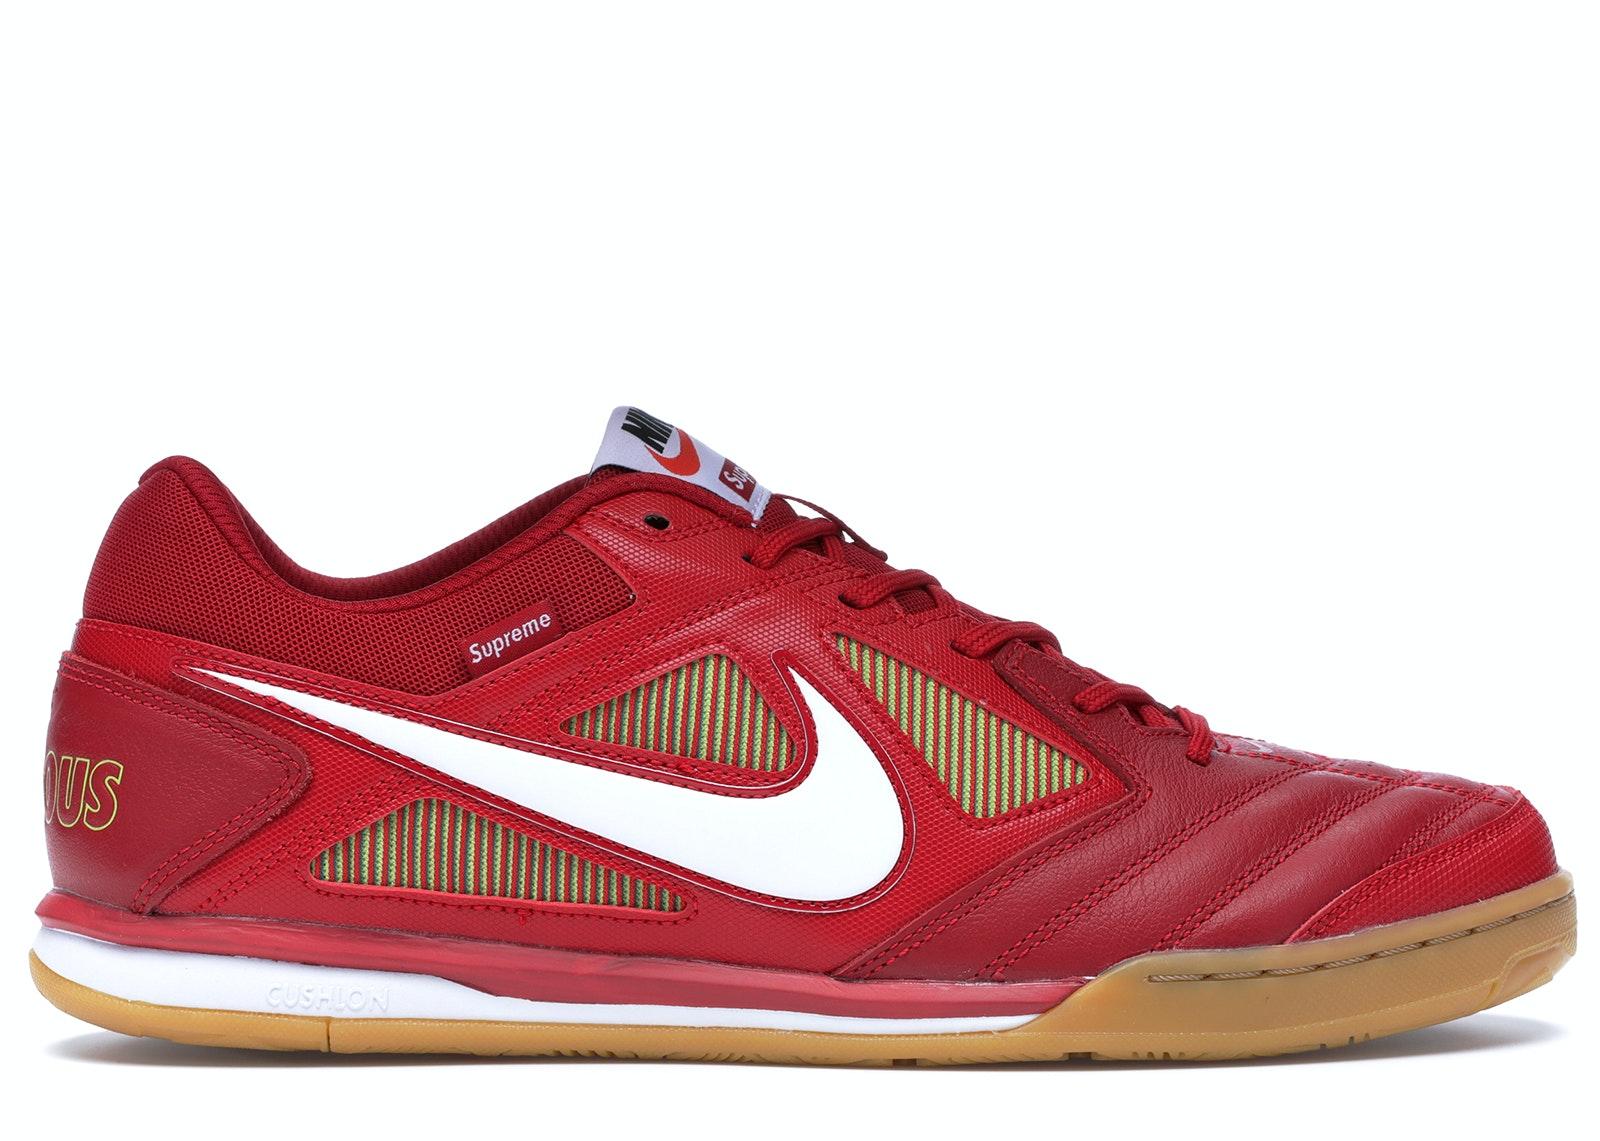 Nike SB Gato Supreme Red